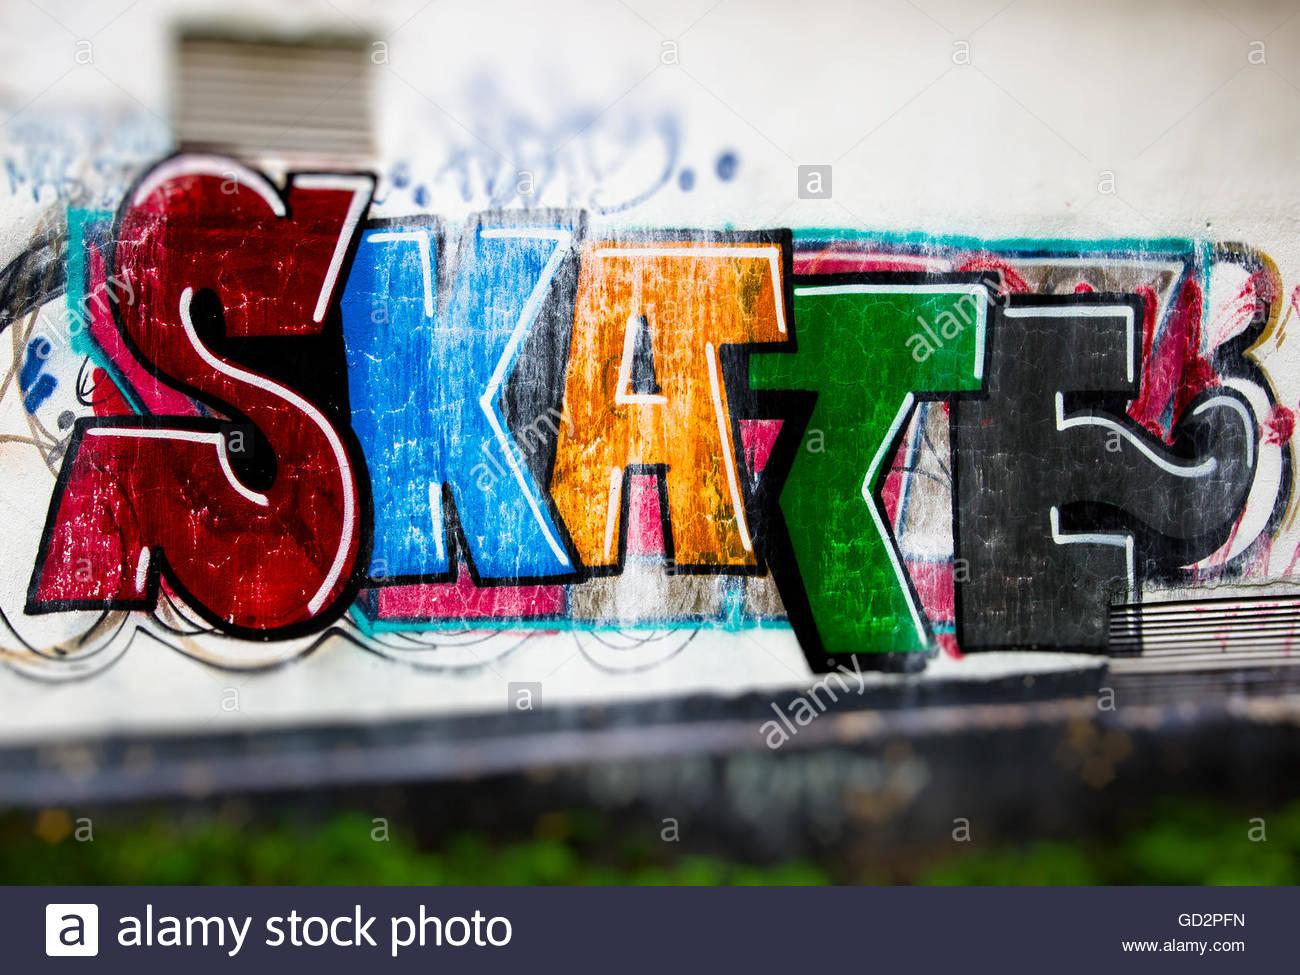 Skate wall graffiti stock photo royalty free image 111314329 alamy skate wall graffiti altavistaventures Images